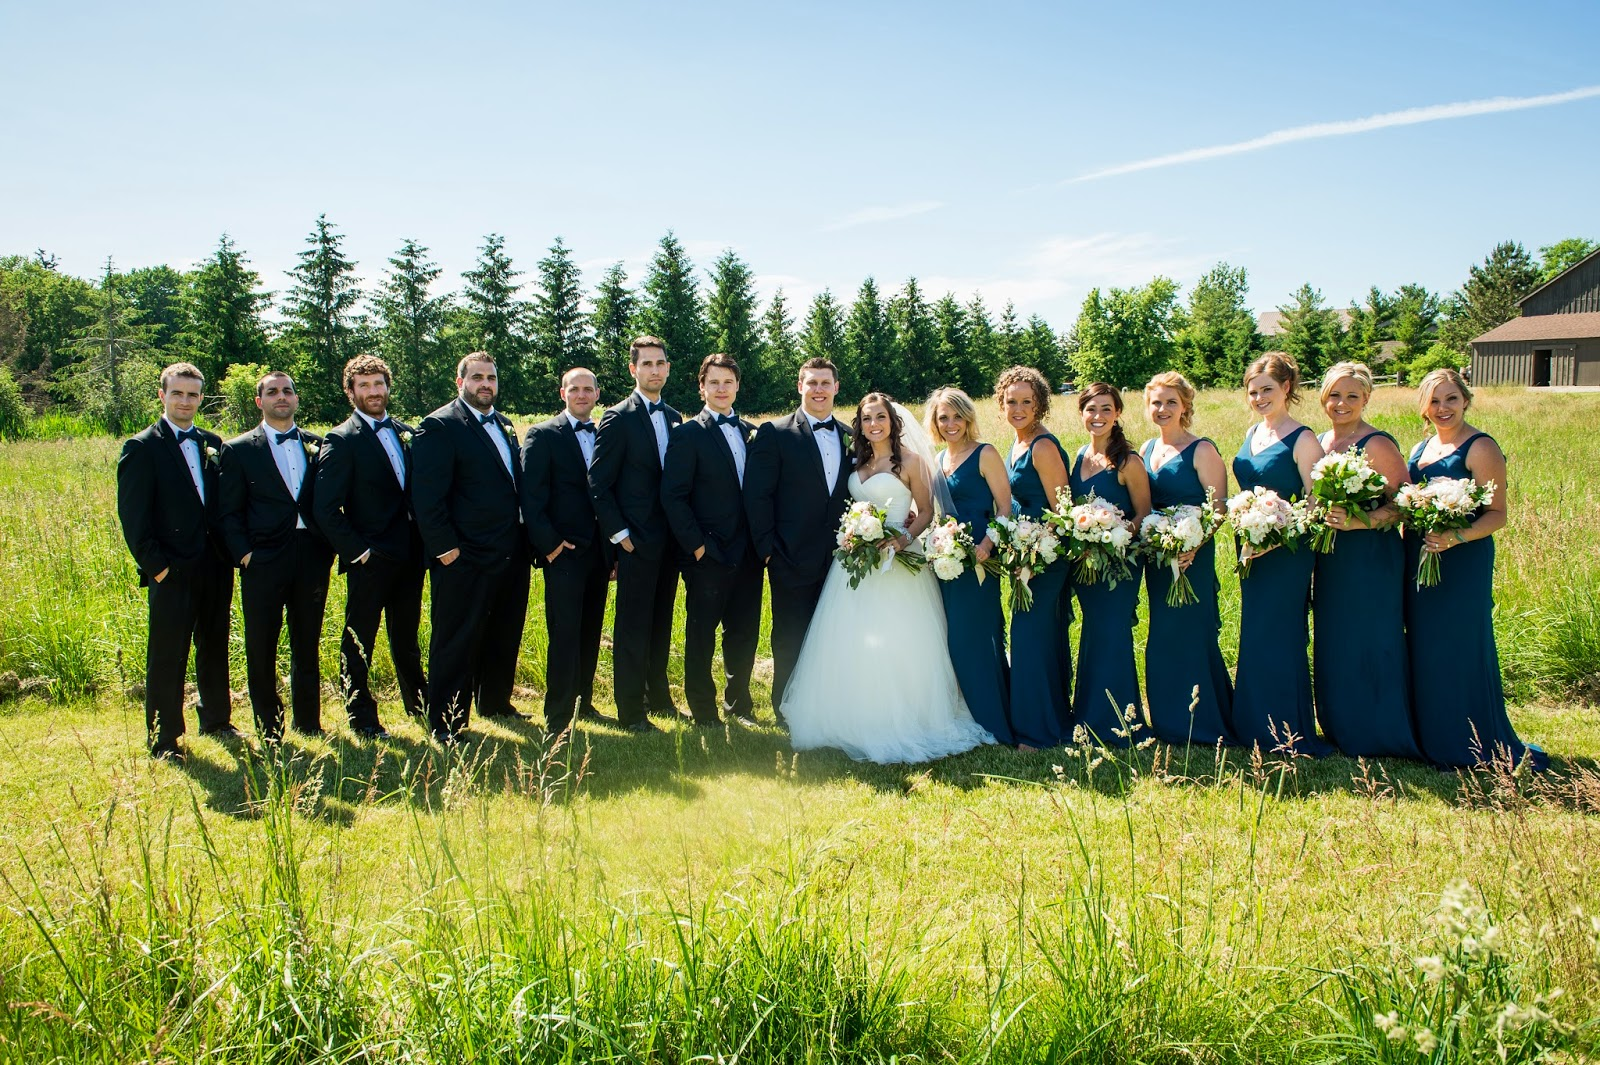 bellamere winery wedding, kj and co. wedding planner burlington ontario hamilton oakville niagara